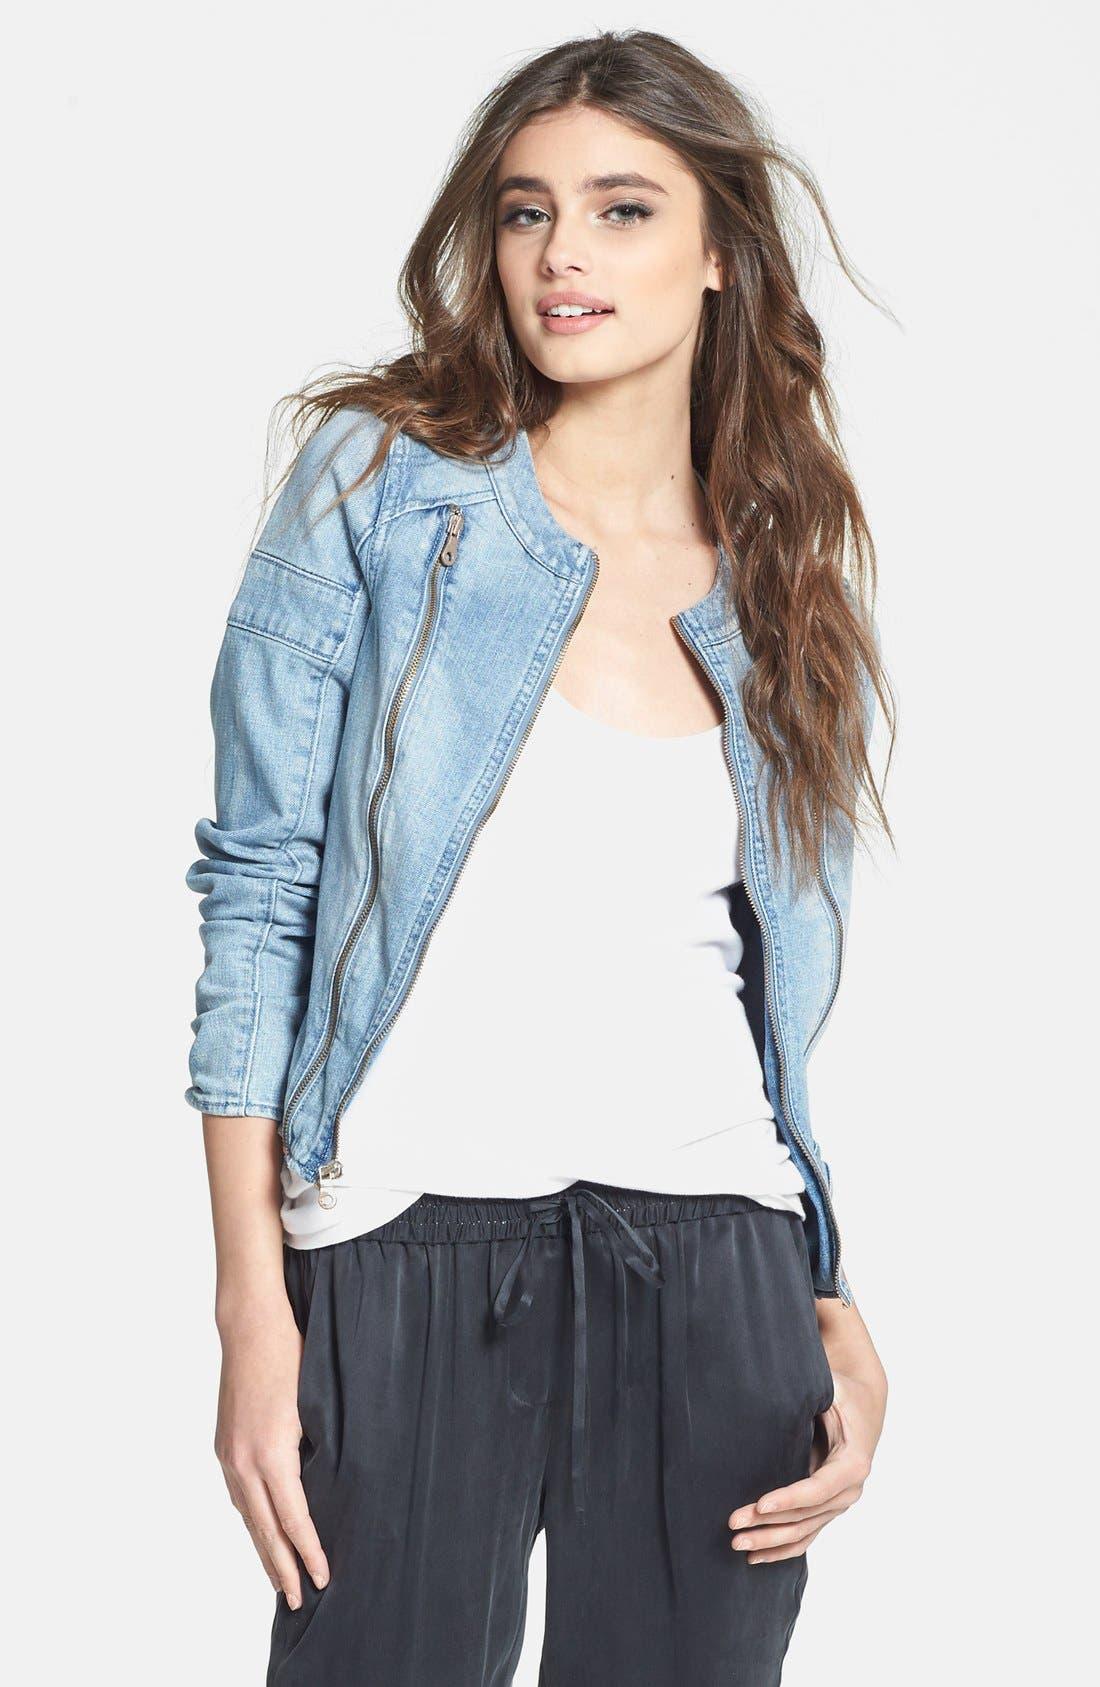 Alternate Image 1 Selected - Paige Denim 'Fairfax' Denim Moto Jacket